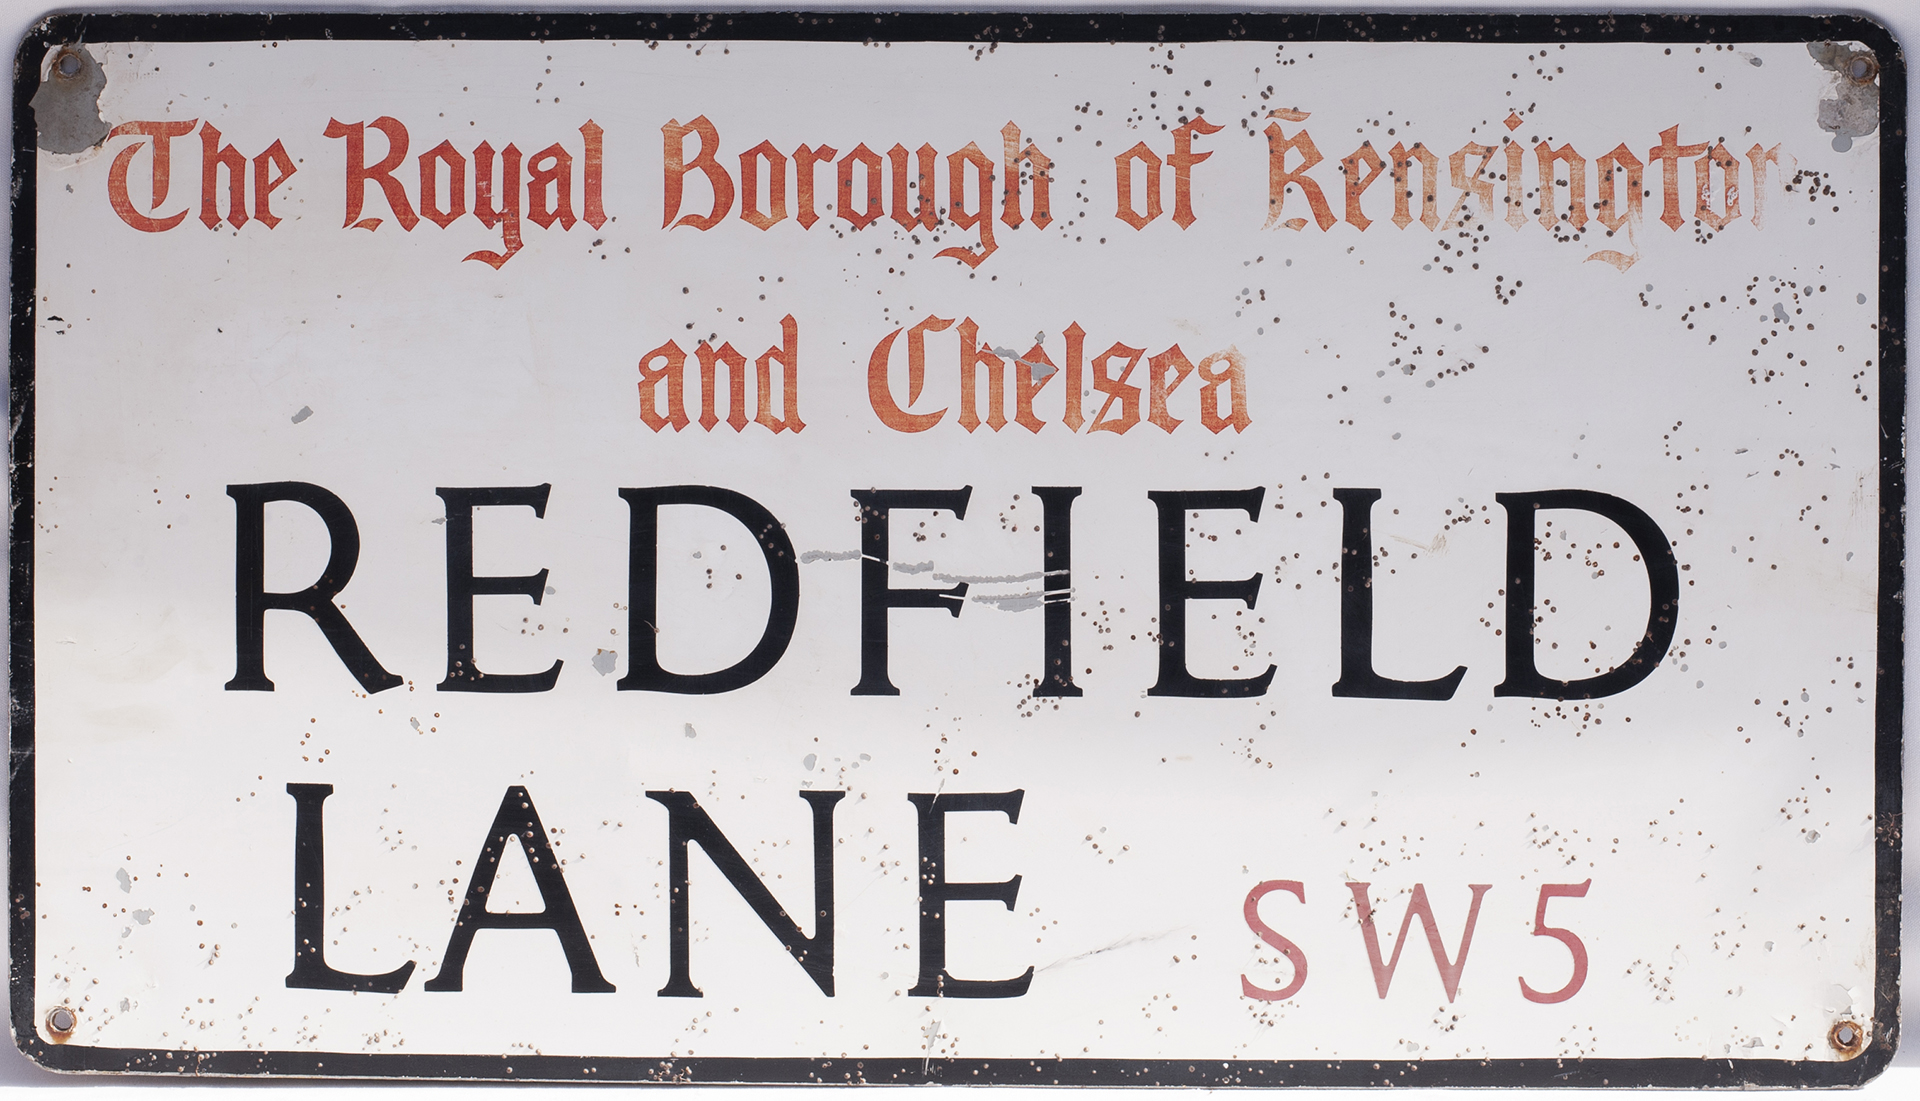 Road Street Sign. REDFIELD LANE THE ROYAL BOROUGH OF KENSINGTON and CHELSEA SW5. Aluminium measuring